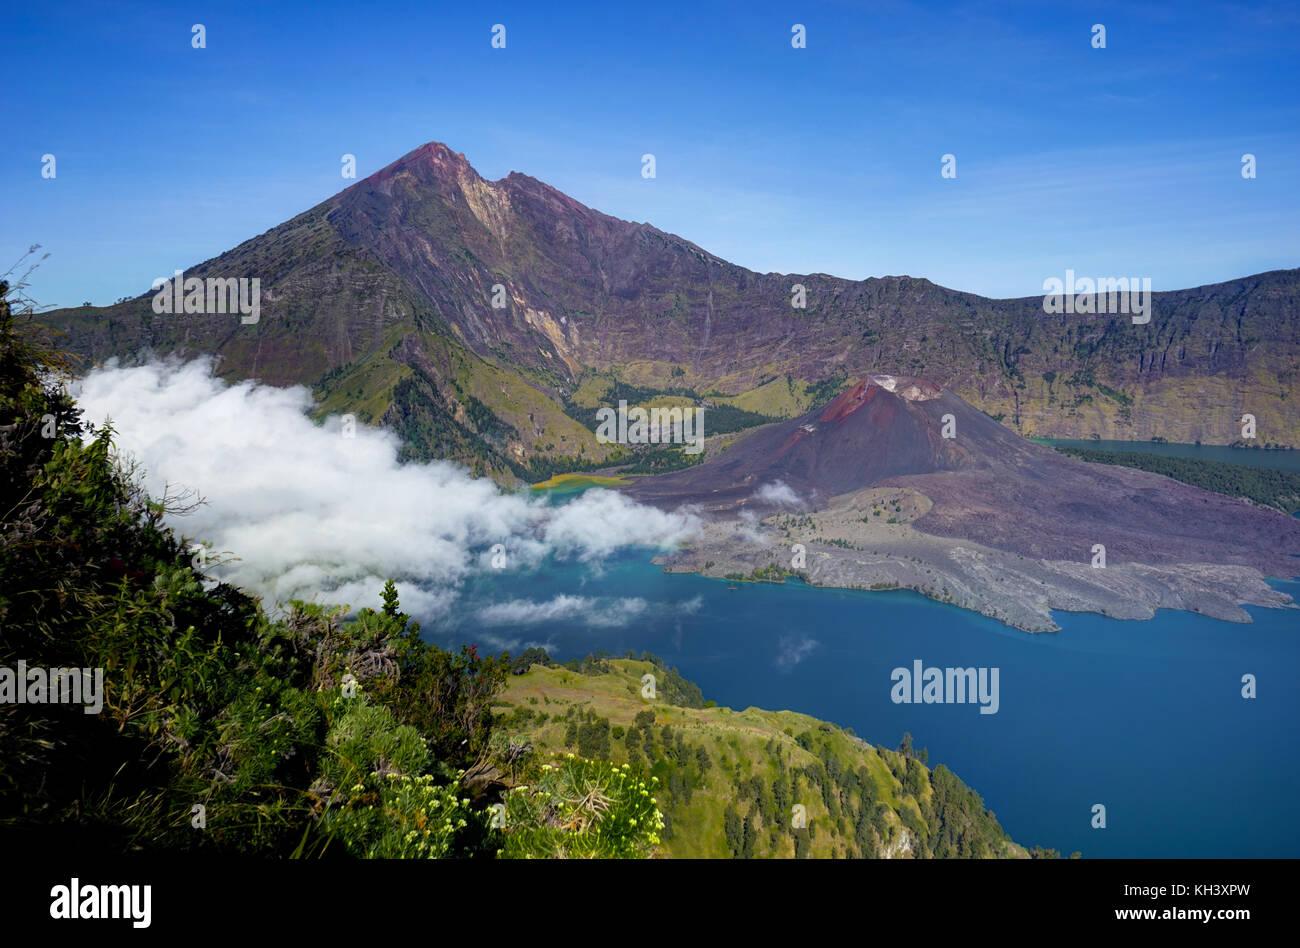 Volcano crater lake of Mount Rinjani Lombok Indonesia - Stock Image